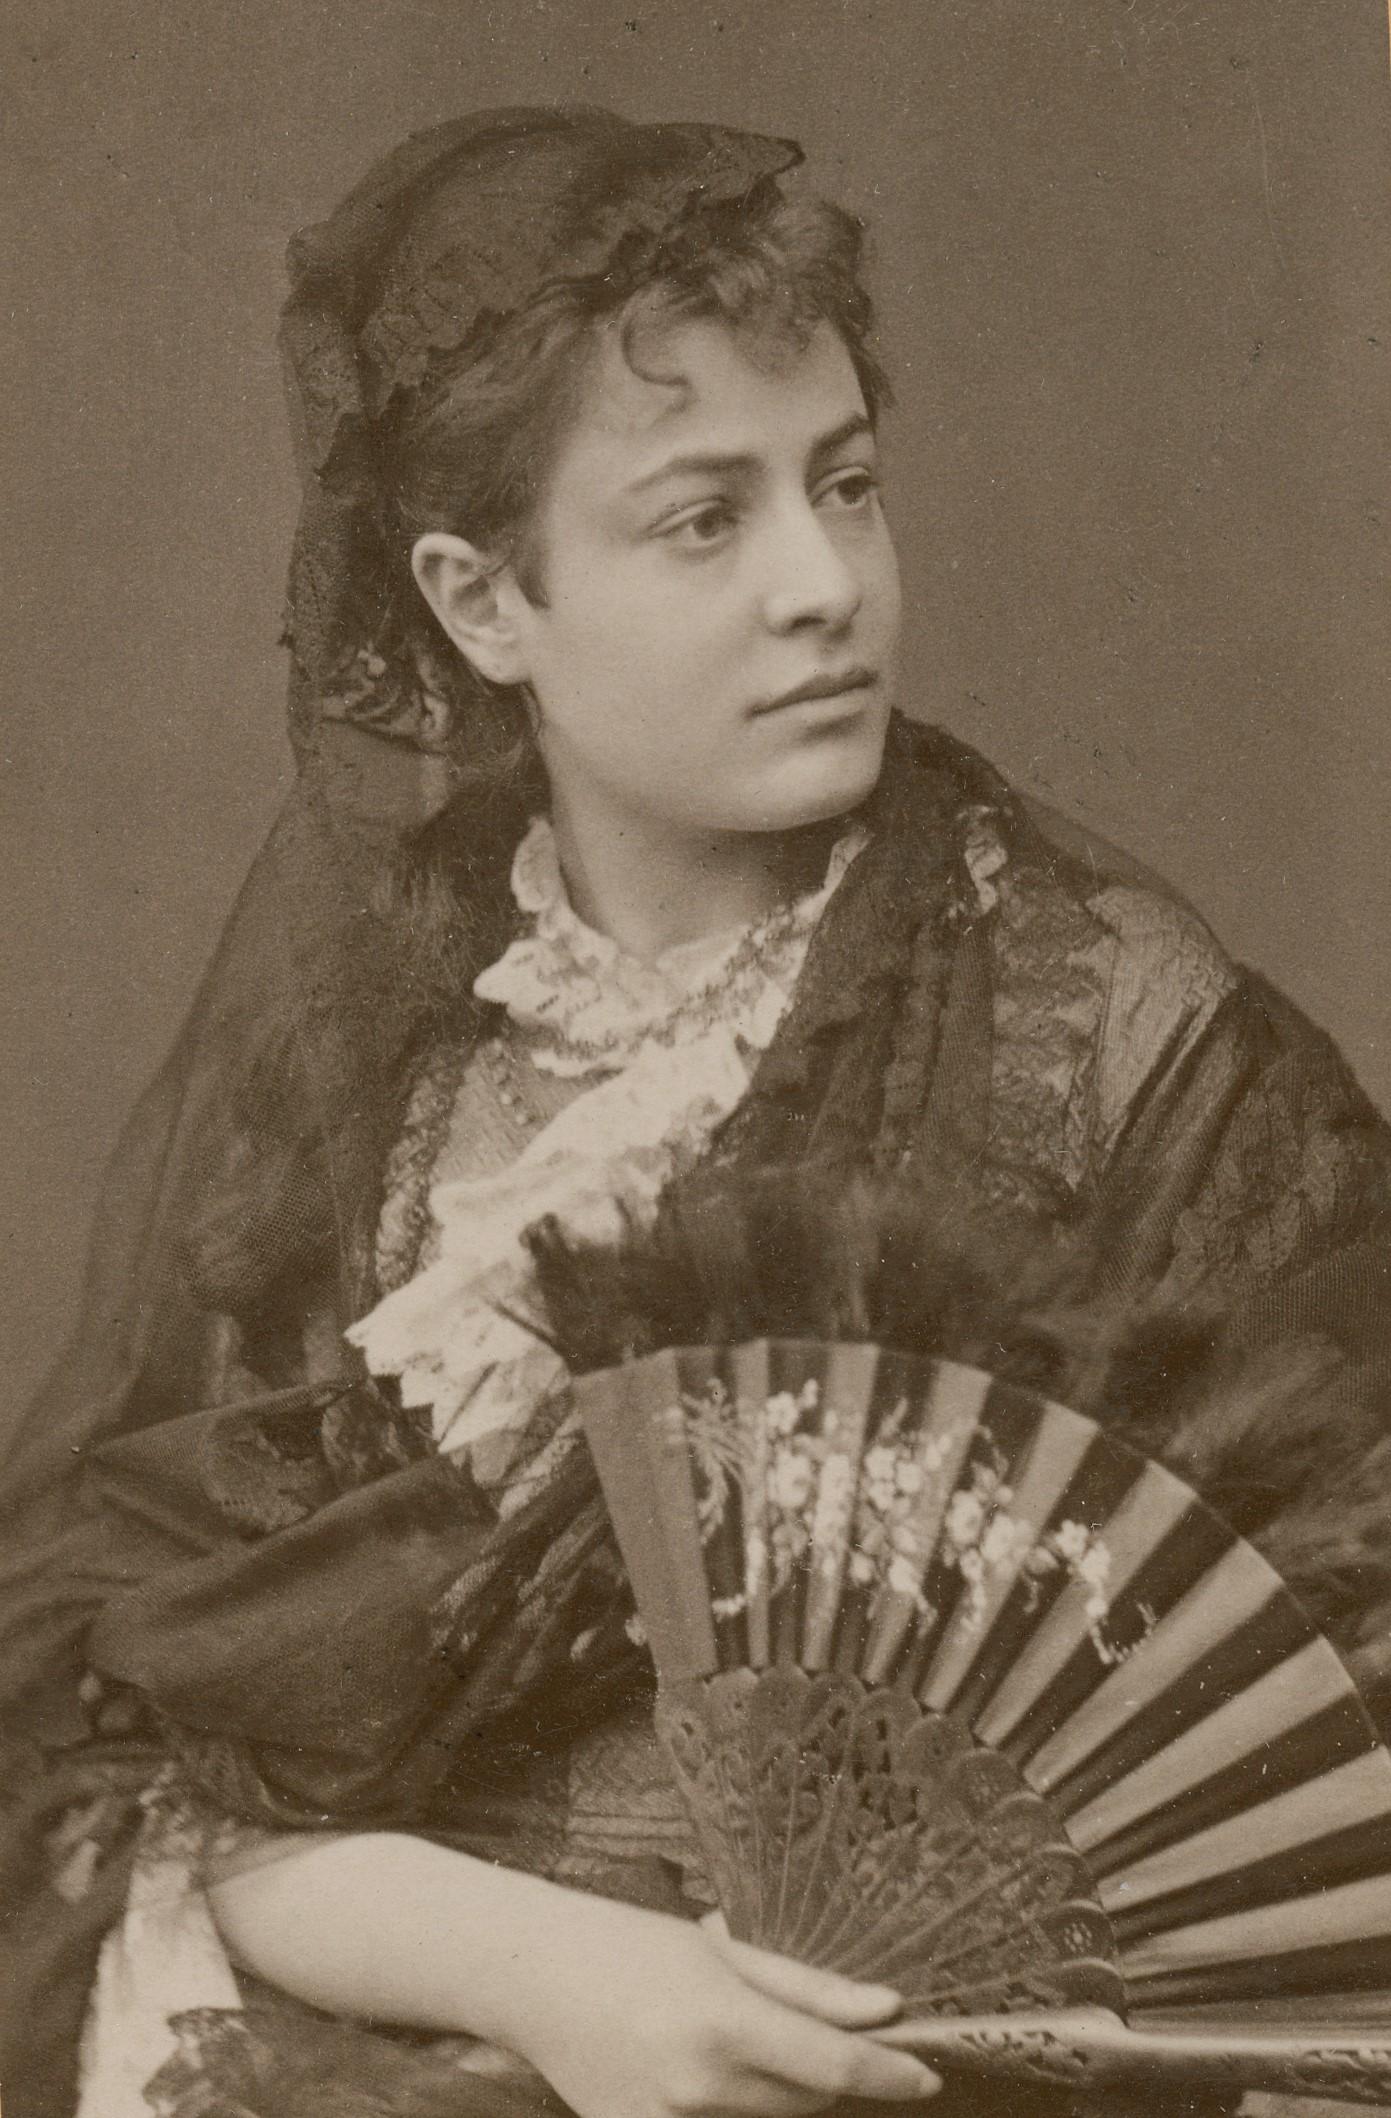 Ida Brander (at the time Ida Reis) in the title role in the play Främlingen, at Nya teatern 1878. Photo: Gösta Florman (1831-1900).  Musik- och teaterbiblioteket, Stockholm, H2 007